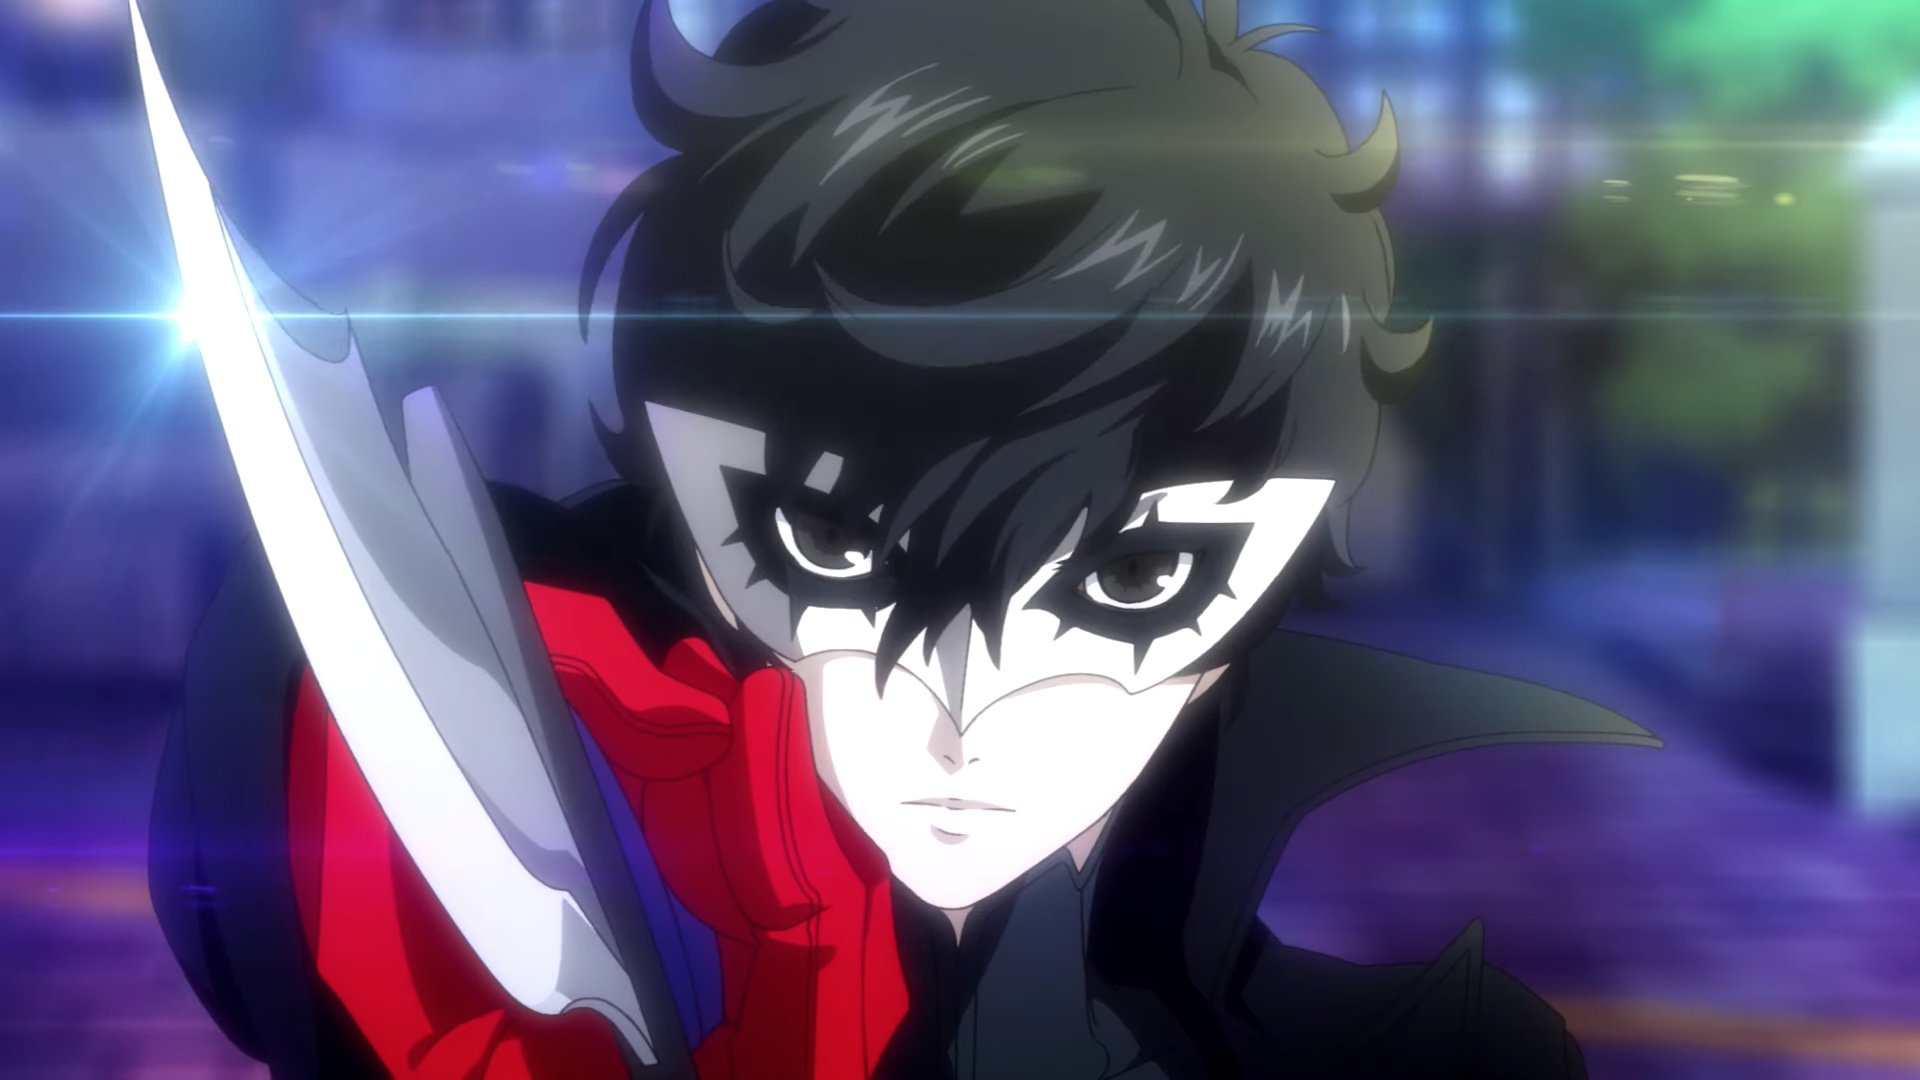 Persona 5 Scramble: The Phantom Strikers Officially